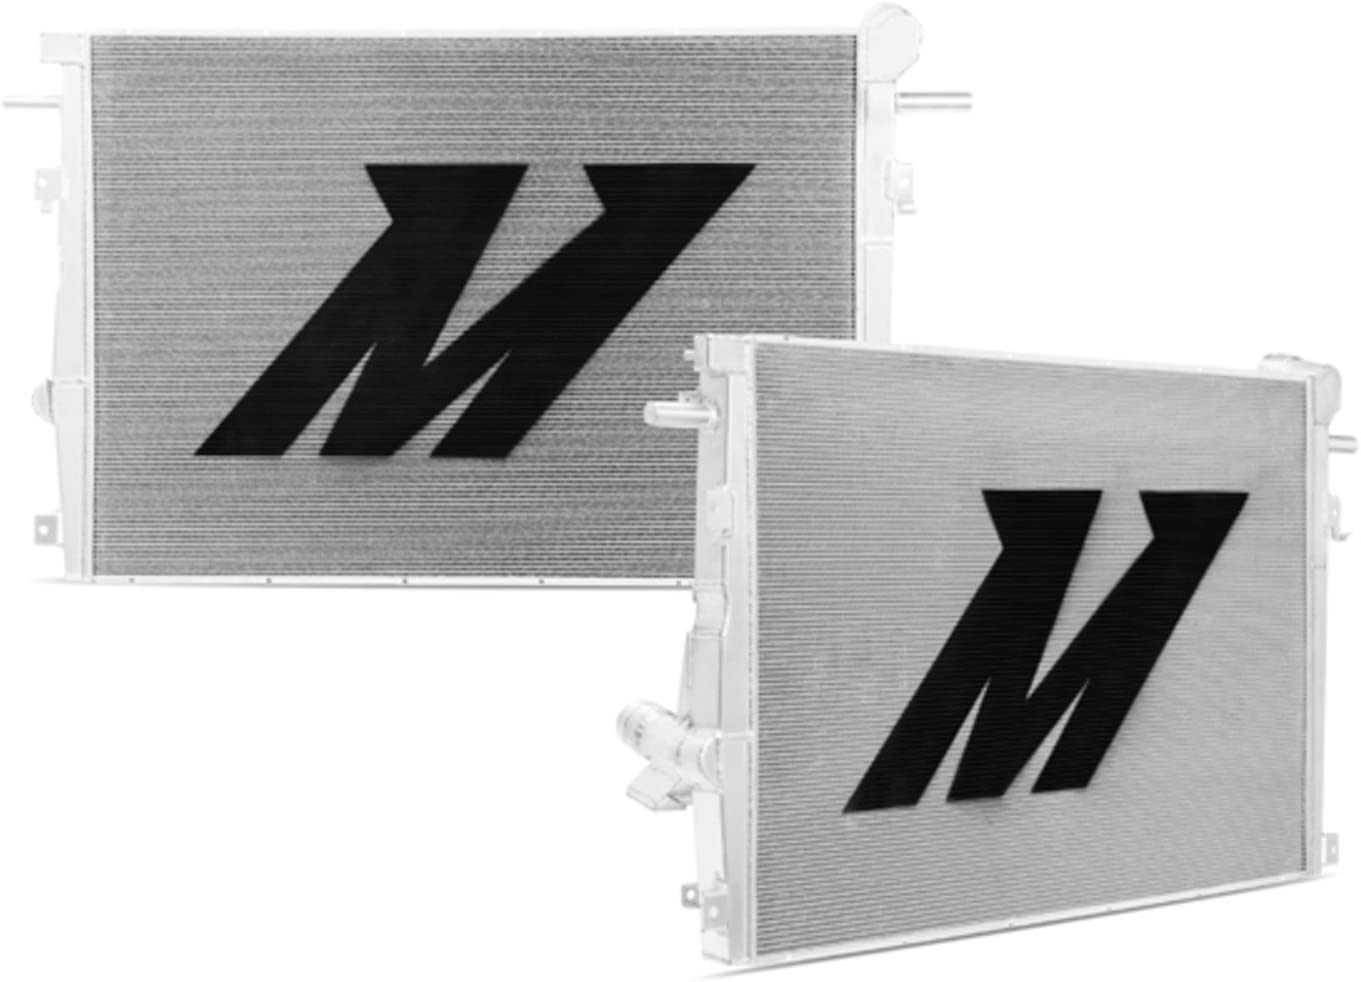 Mishimoto MMRAD-F2D-11 Ford 6.7L Powerstroke Aluminum Primary Radiator Silver 2011+